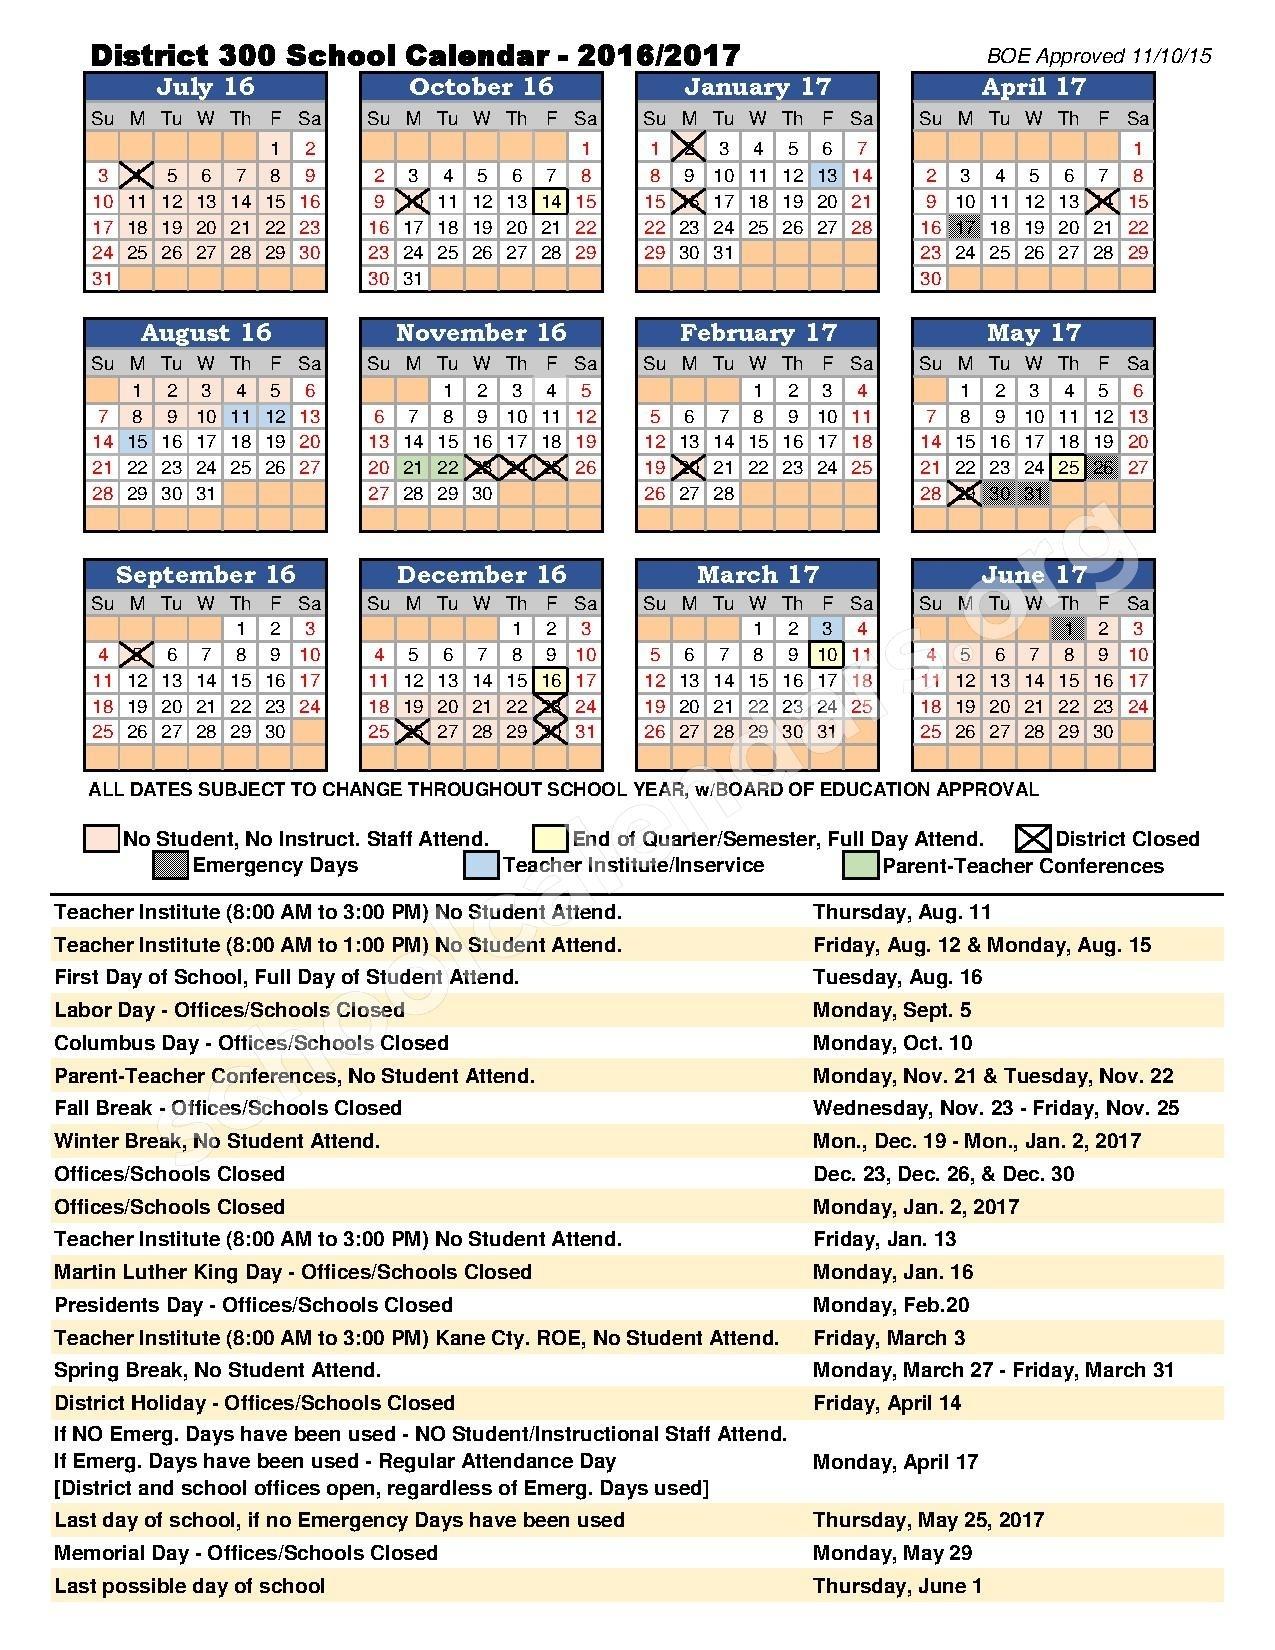 2016 - 2017 District Calendar | Community Unit School District 300_School Calendar District 300